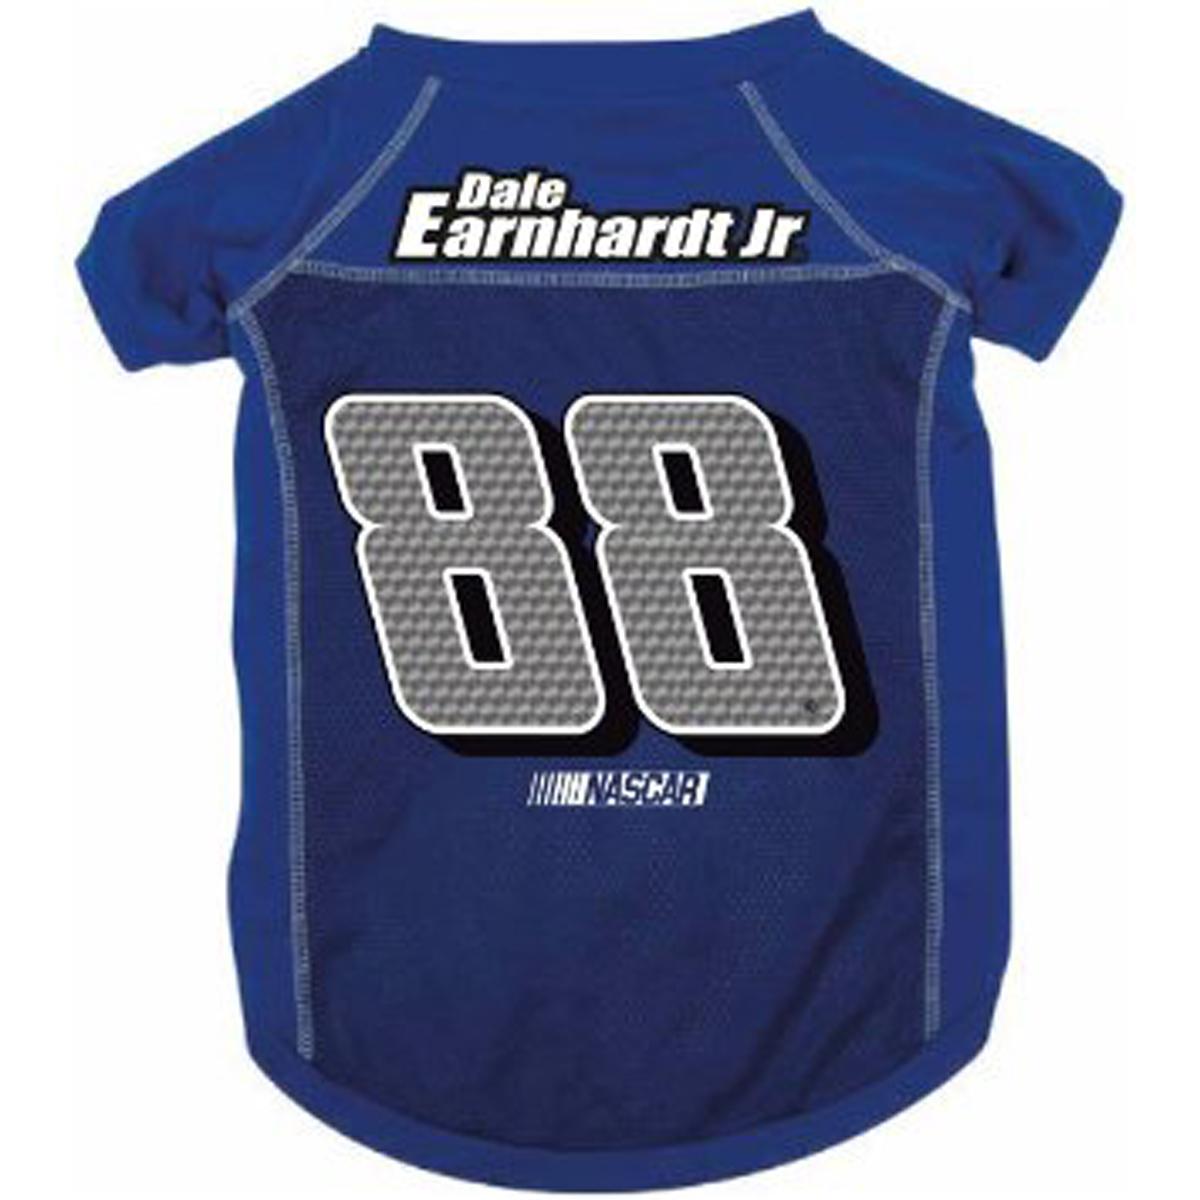 Dale Earnhardt Jr. Dog Jersey - Blue